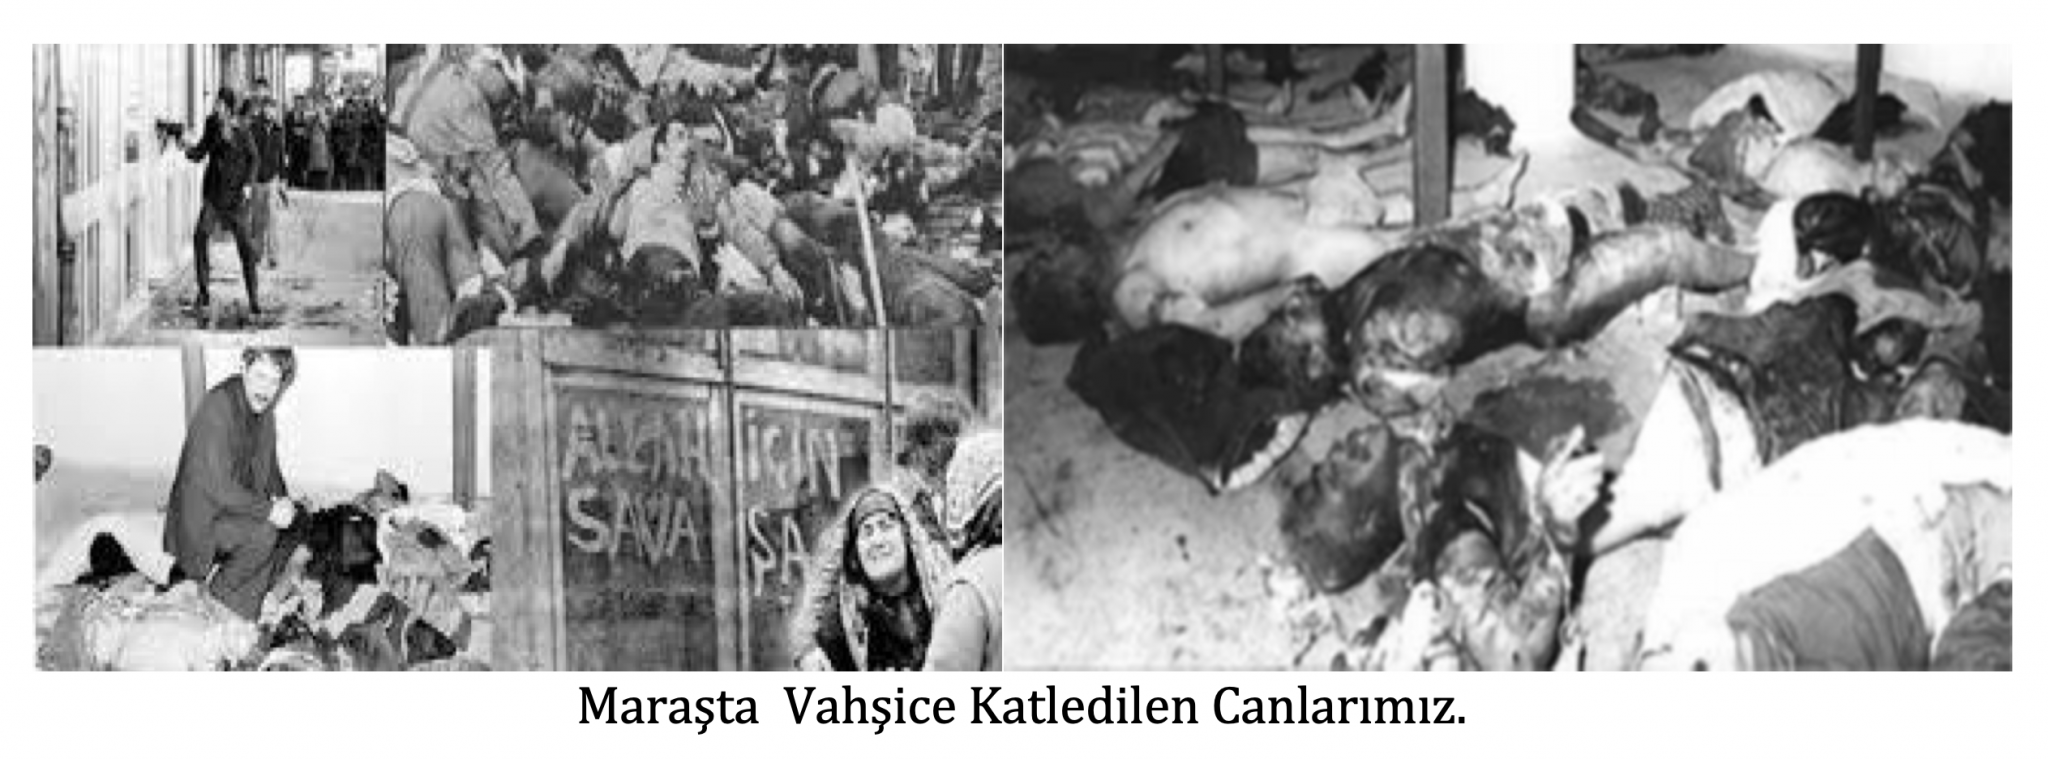 Maraş katliamı Devrimci Alevi bektaşi kızılbas 1